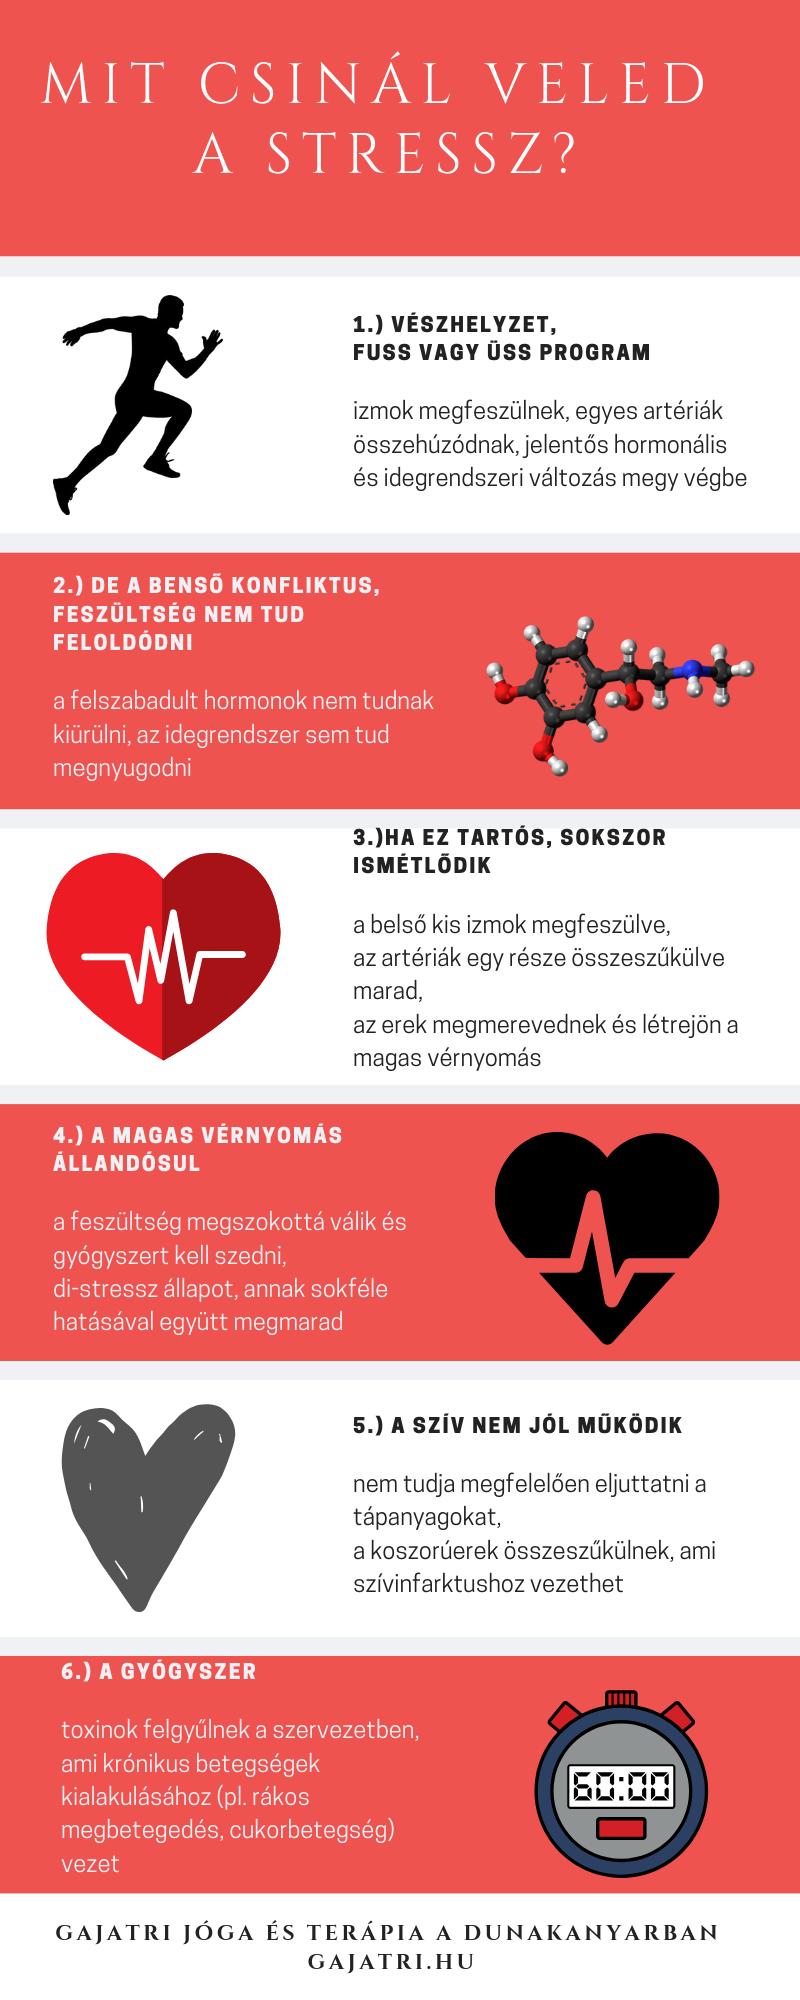 a nephropathia magas vérnyomást okozhat